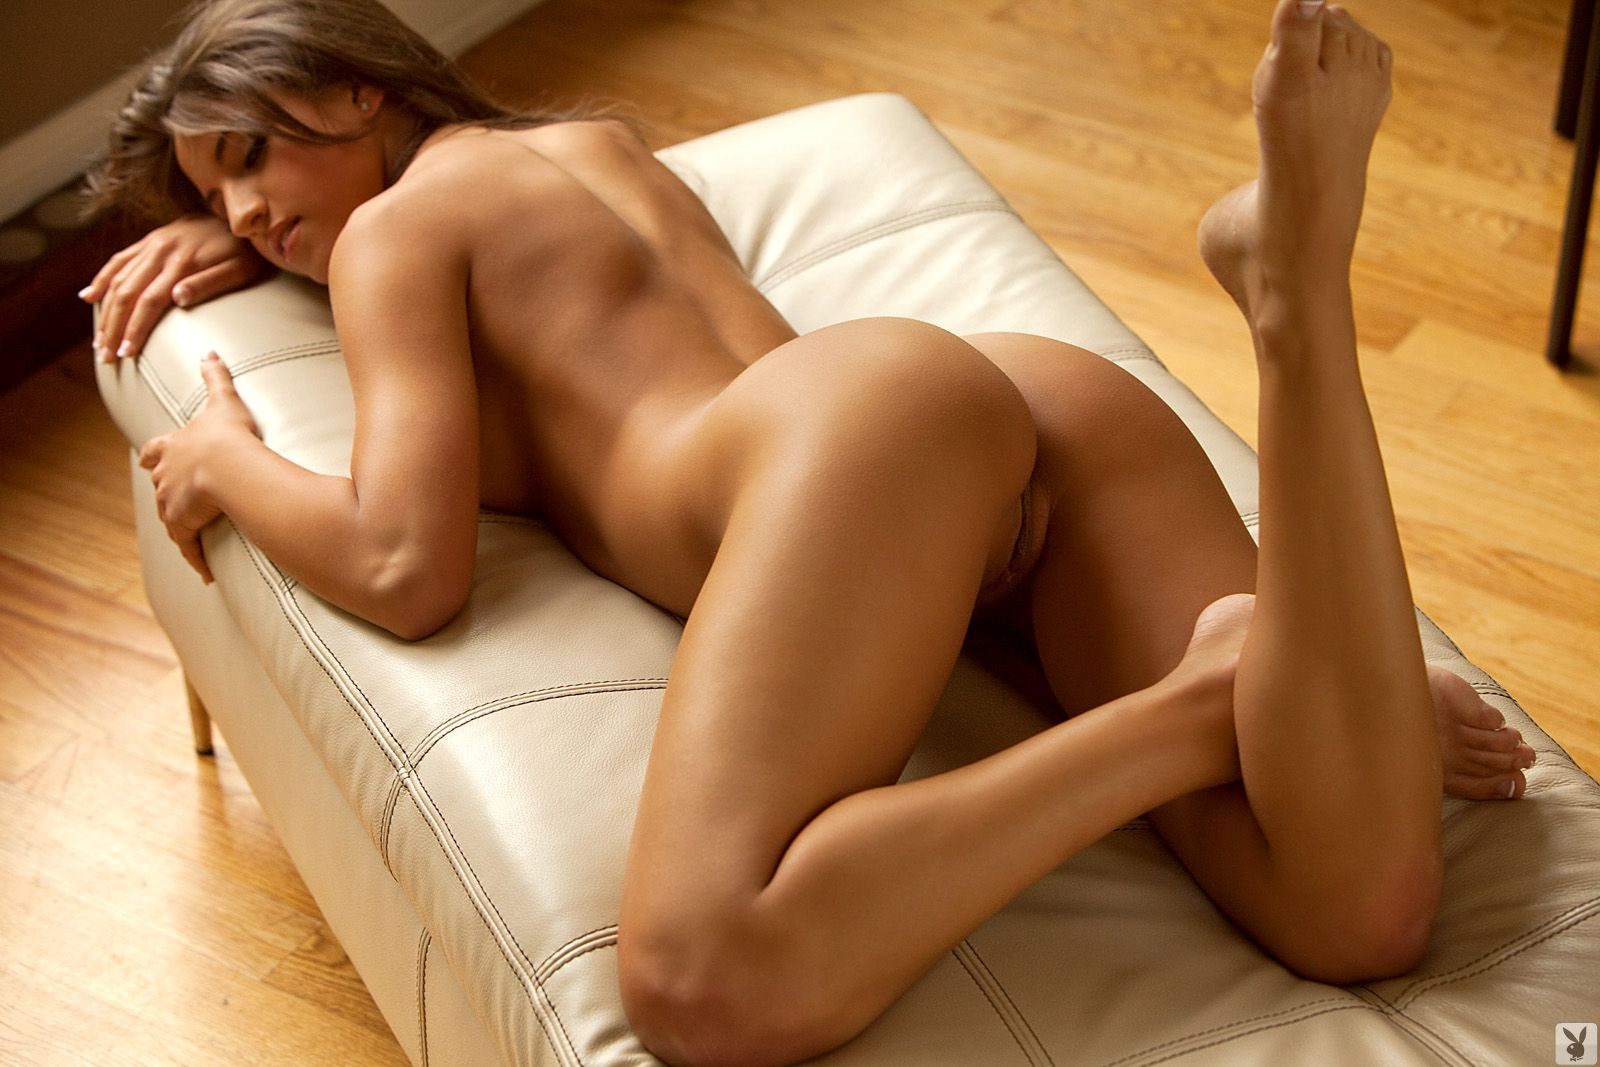 krasivie-figuri-seks-onlayn